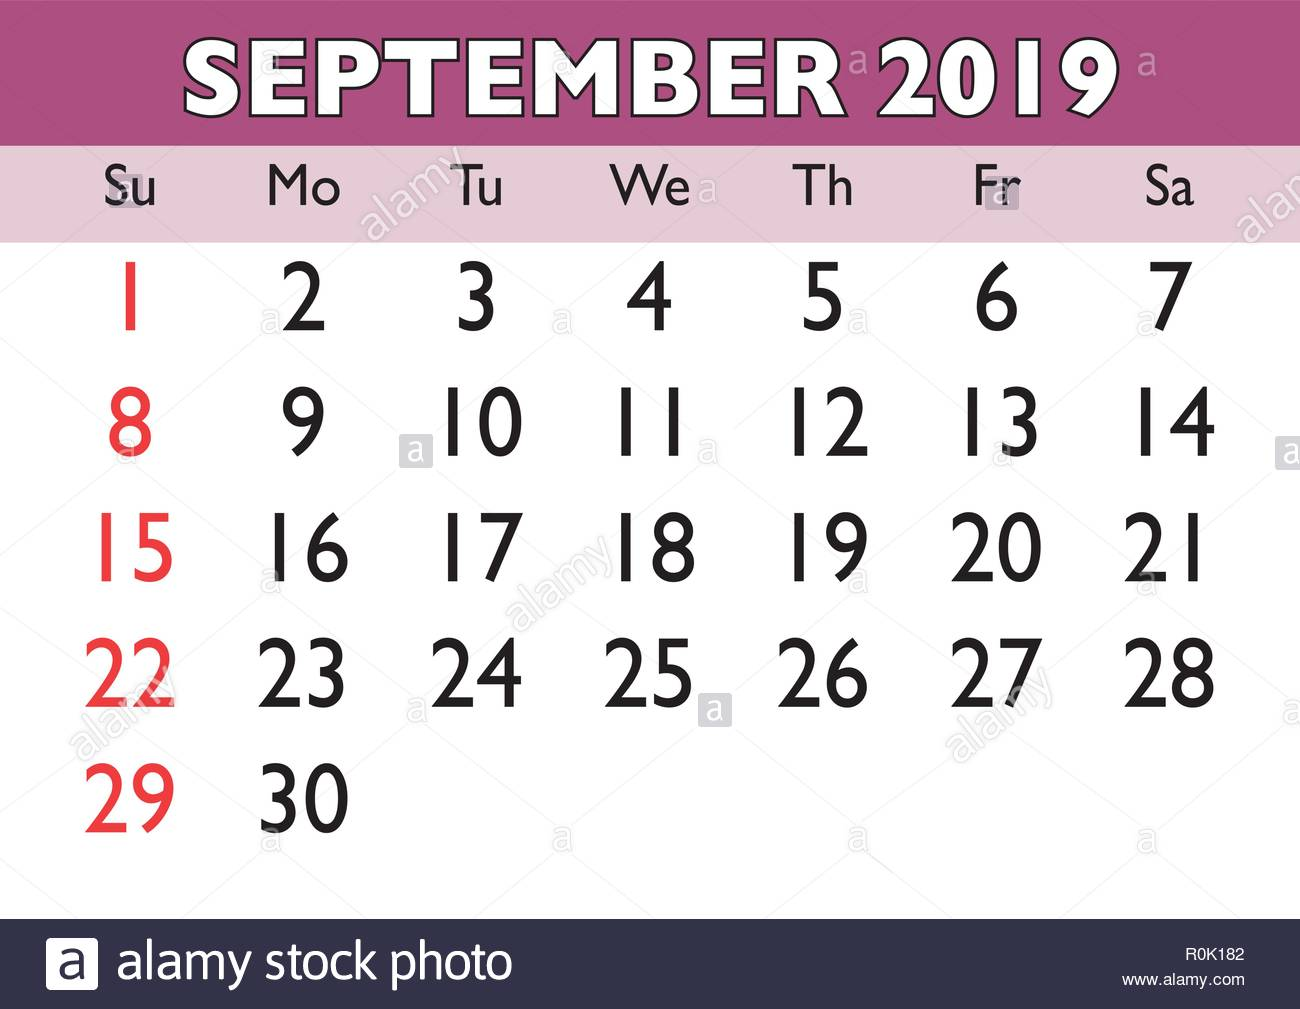 Calendario Mensile Settembre 2020.2019 Calendario Mese Di Settembre Vettore Calendario